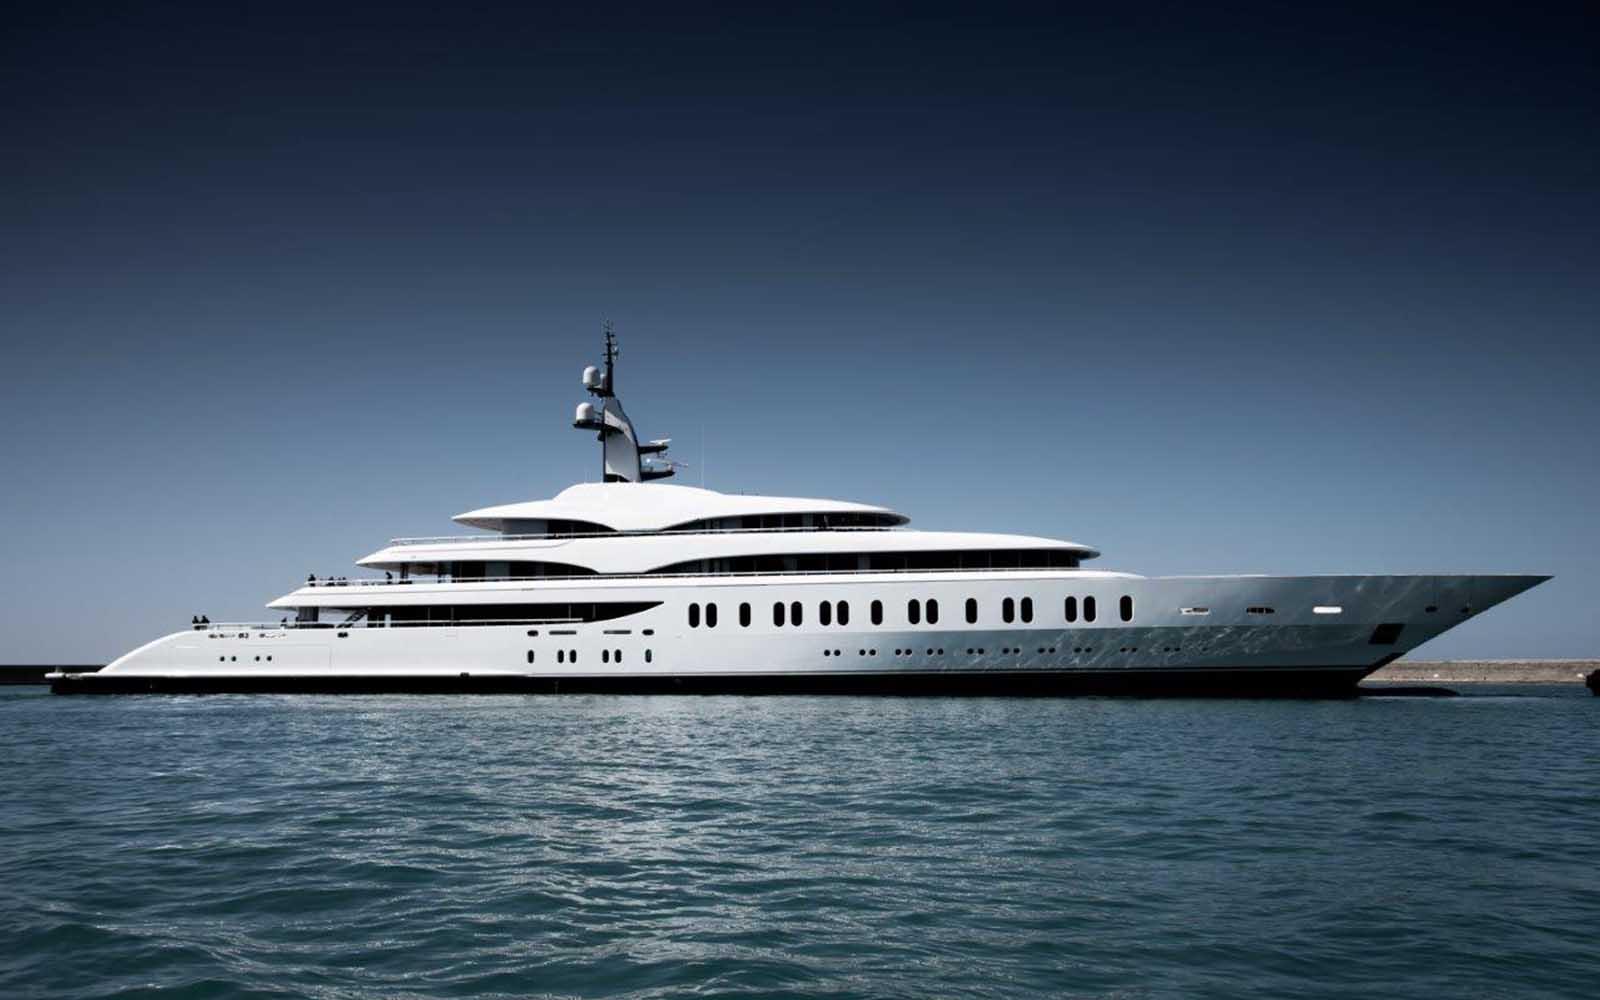 superiate benetti giga yacht - boat shopping